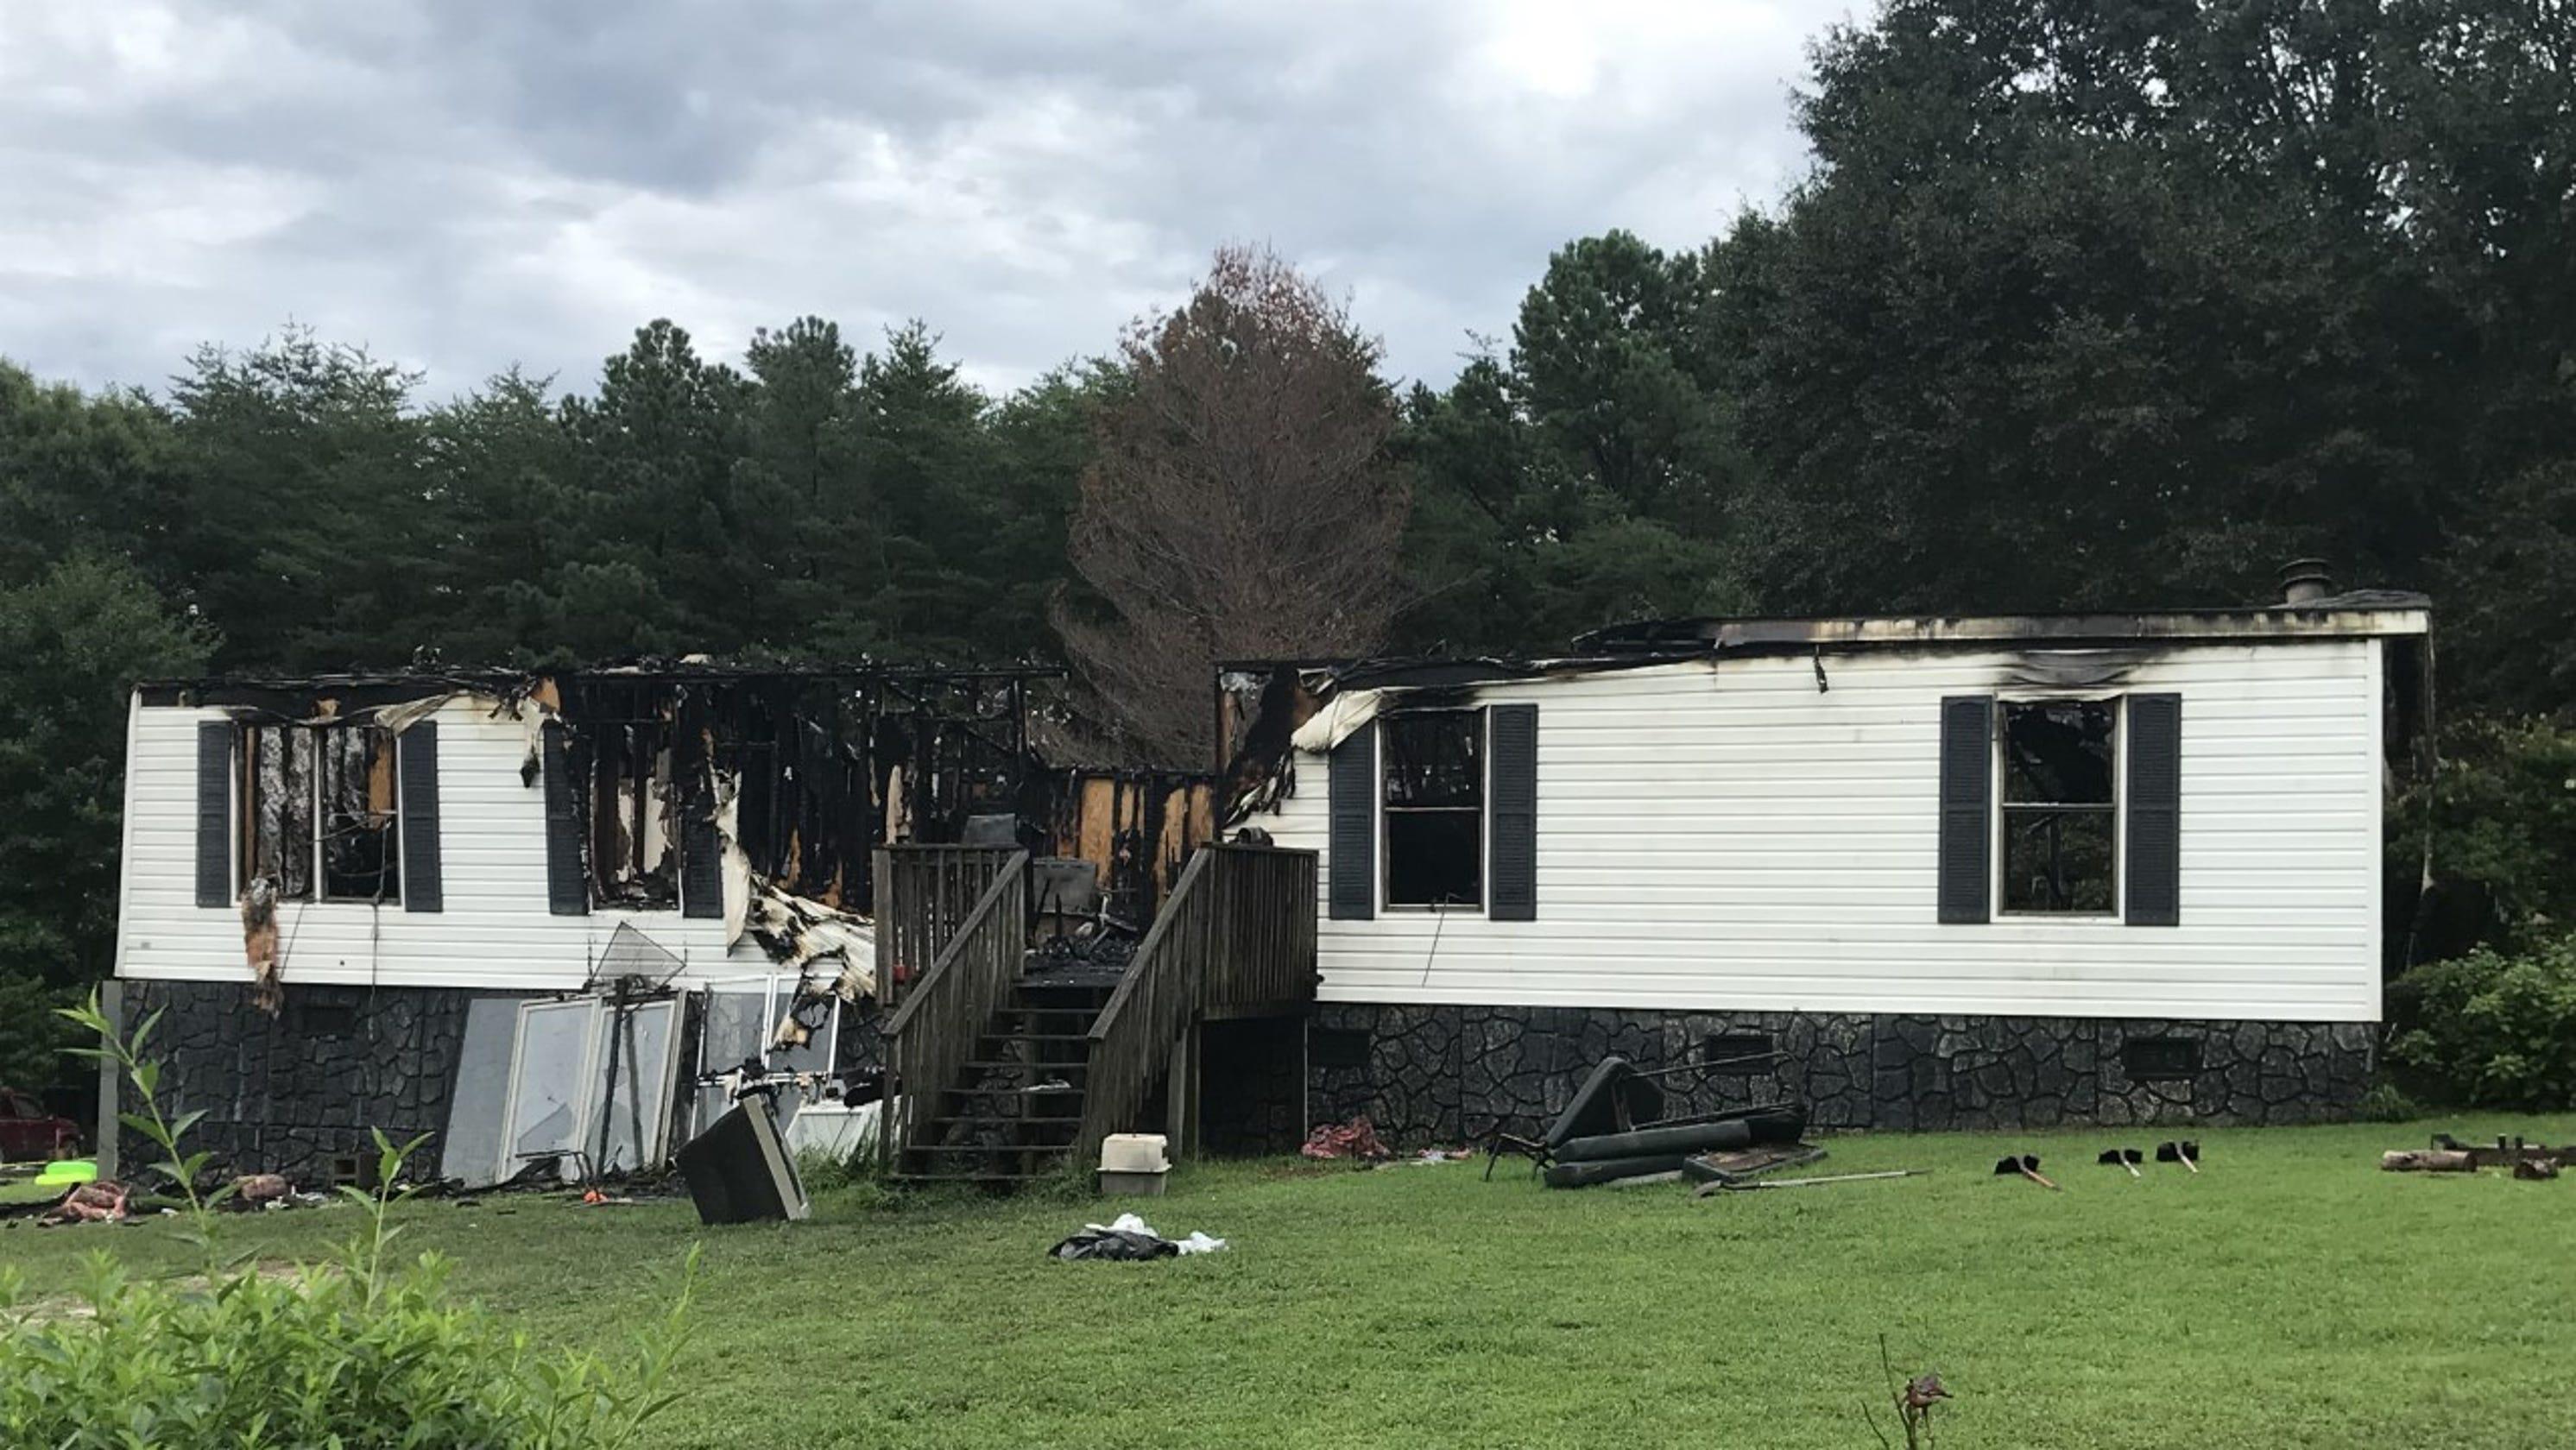 Arson suspected in fire that killed 2 men near Walhalla